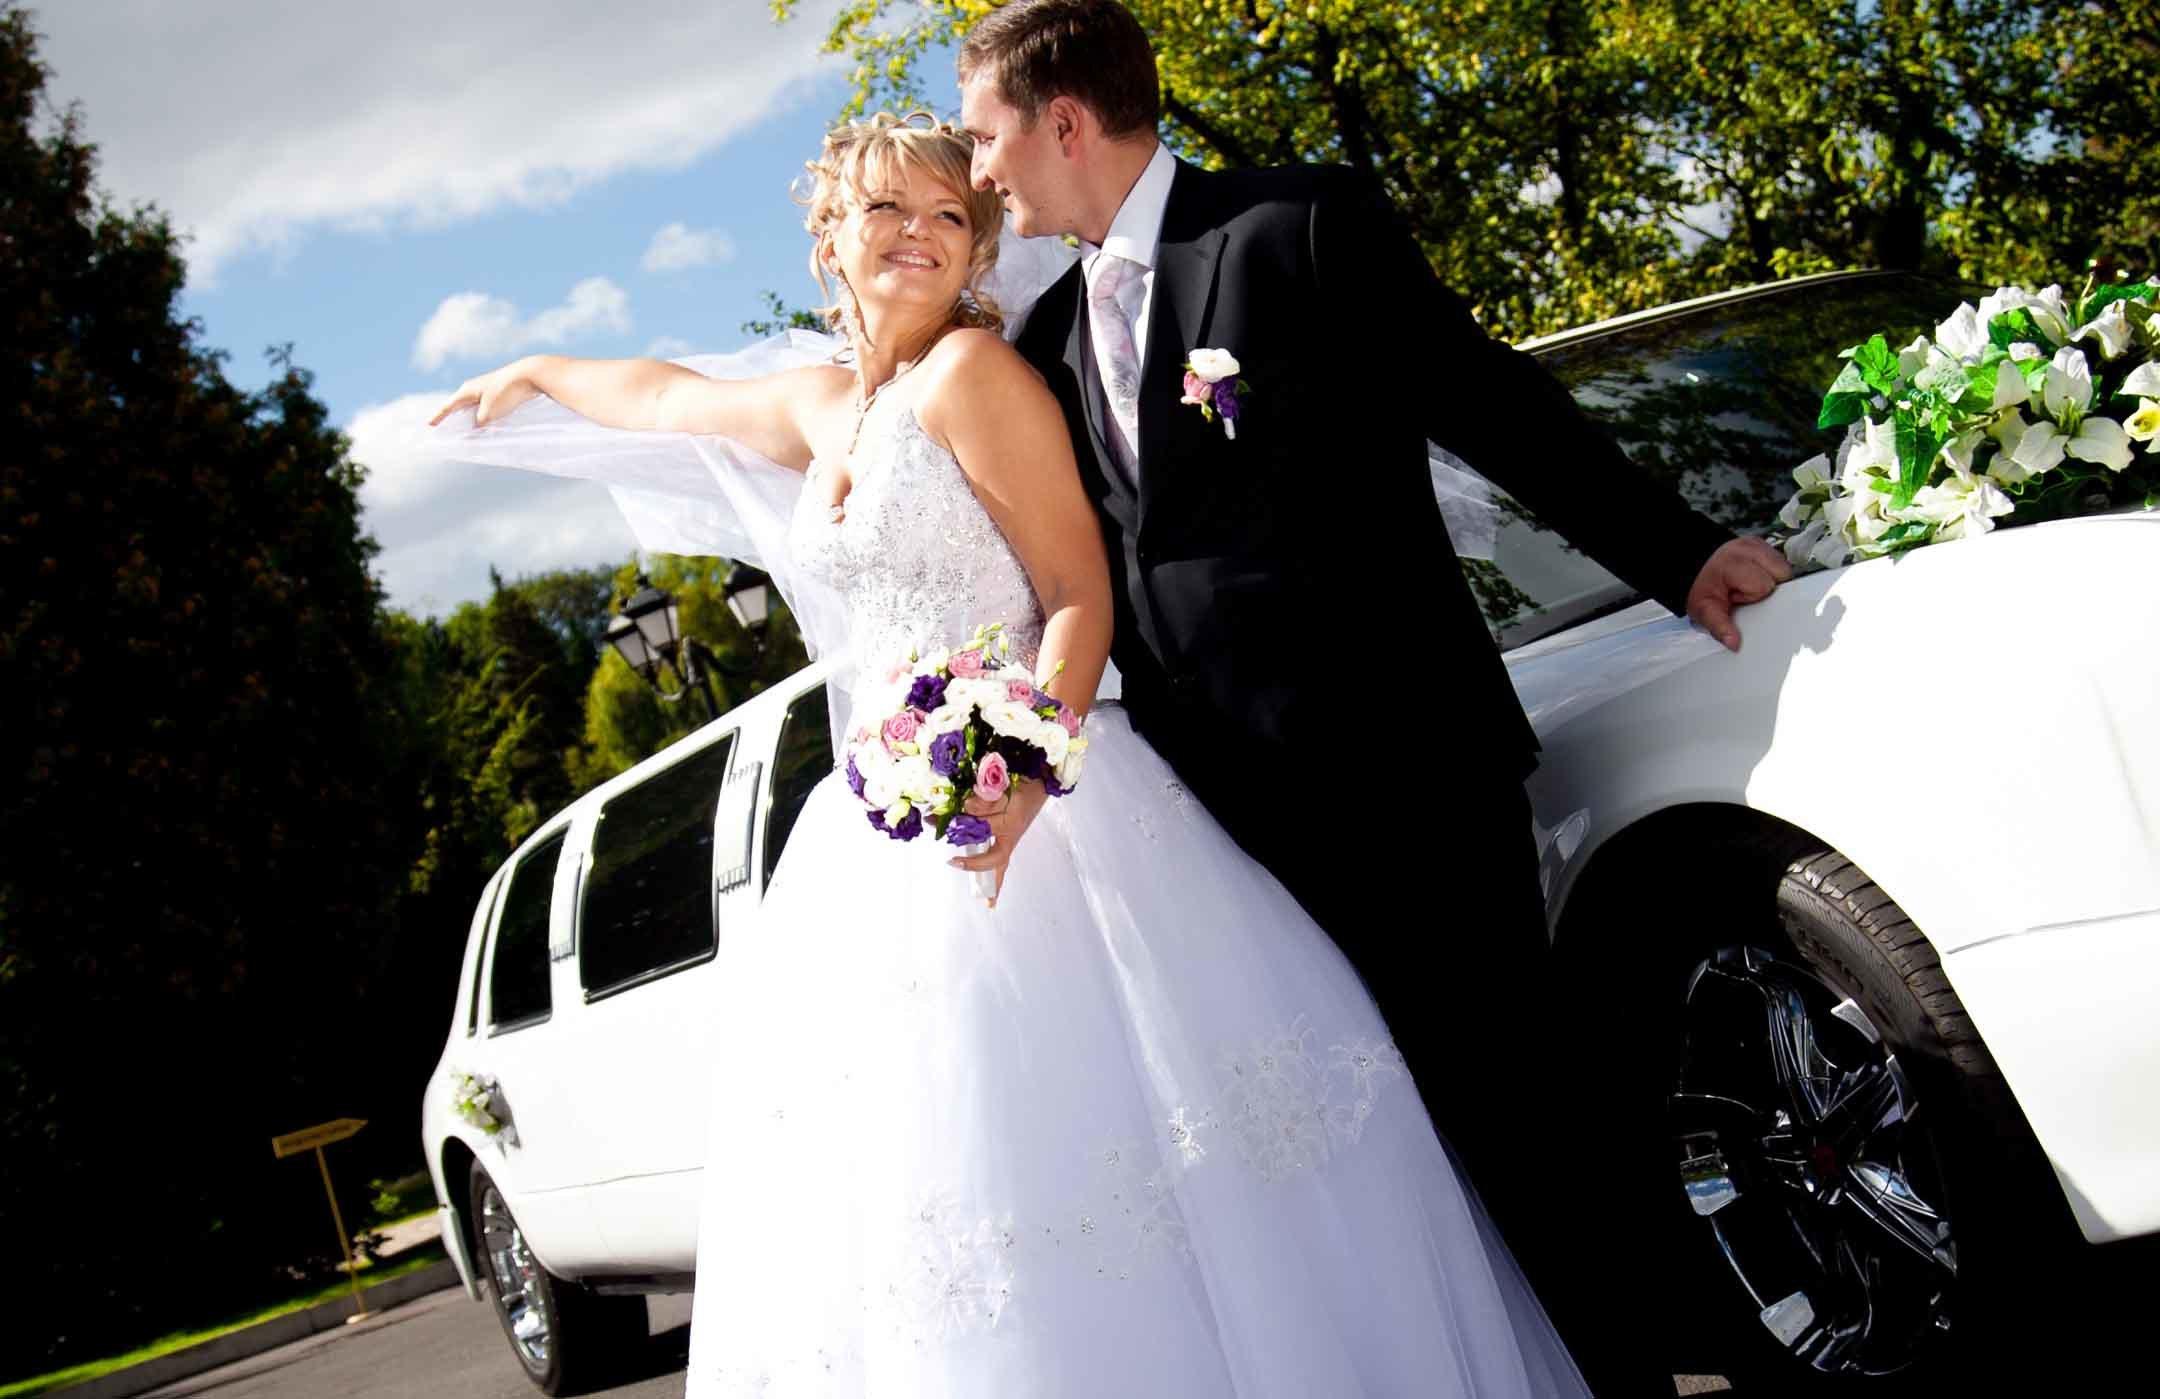 wedding limo dallas Wedding Limo Event Rental Service DFW Dallas Fort Worth